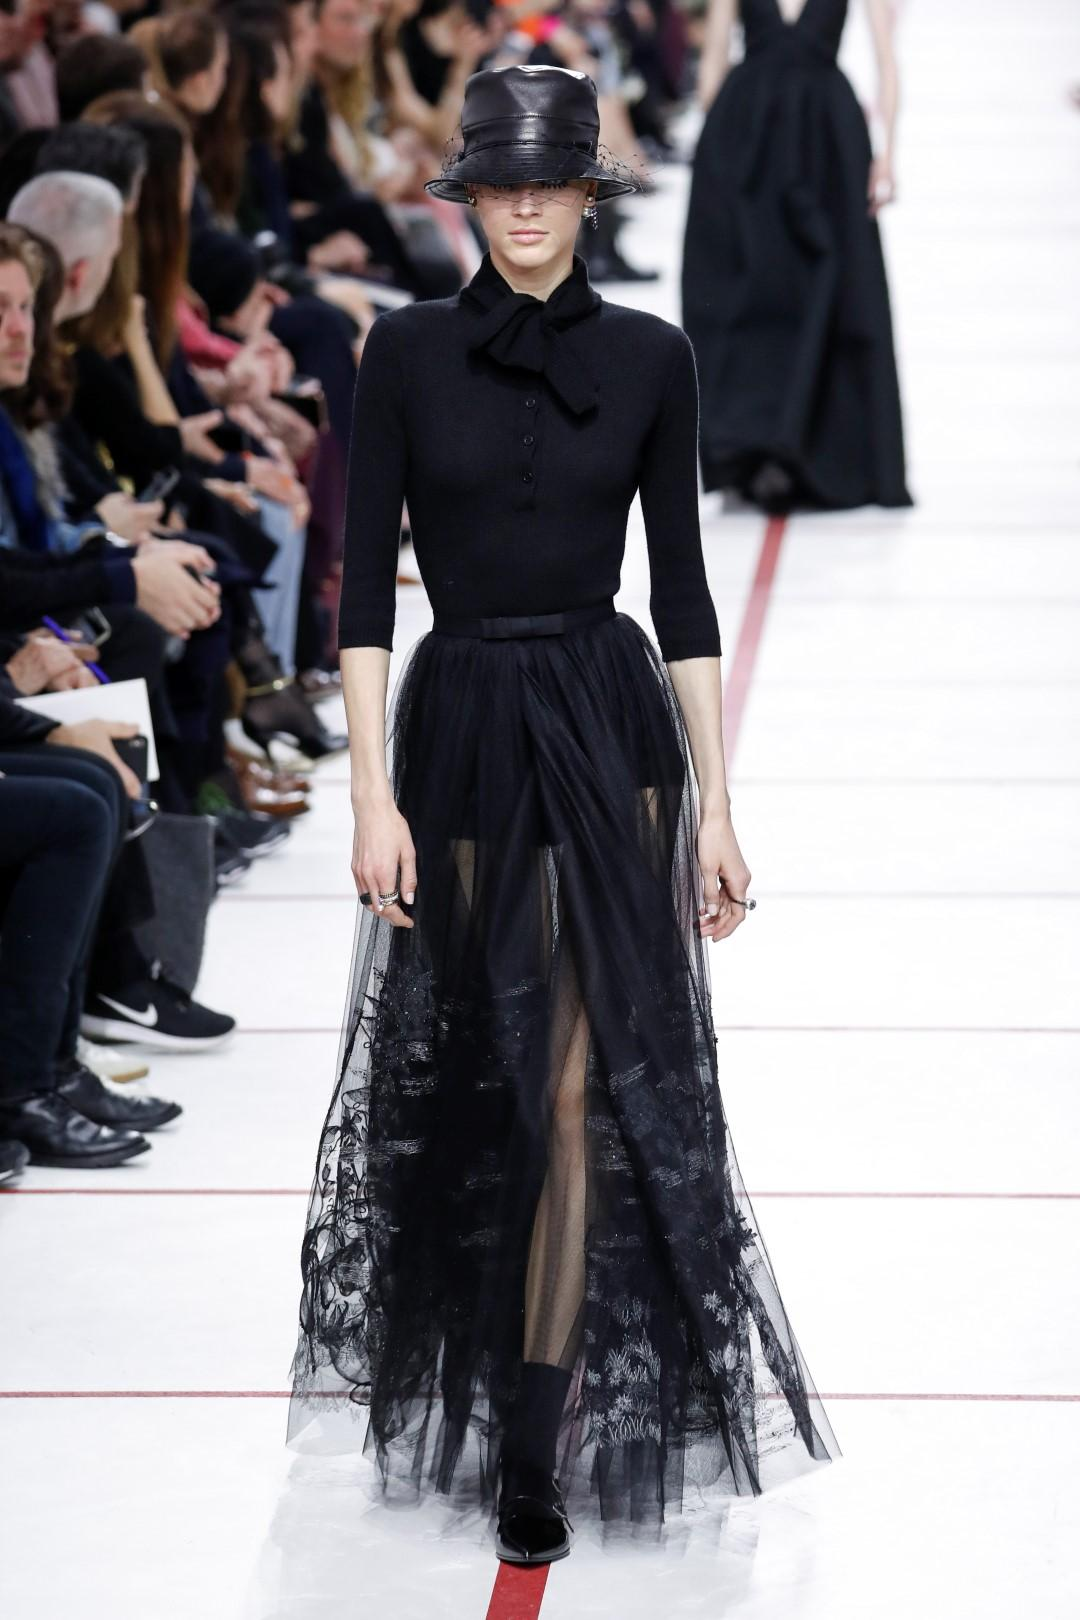 Christian Dior, da Parigi una 'petit garçon' oltre gli